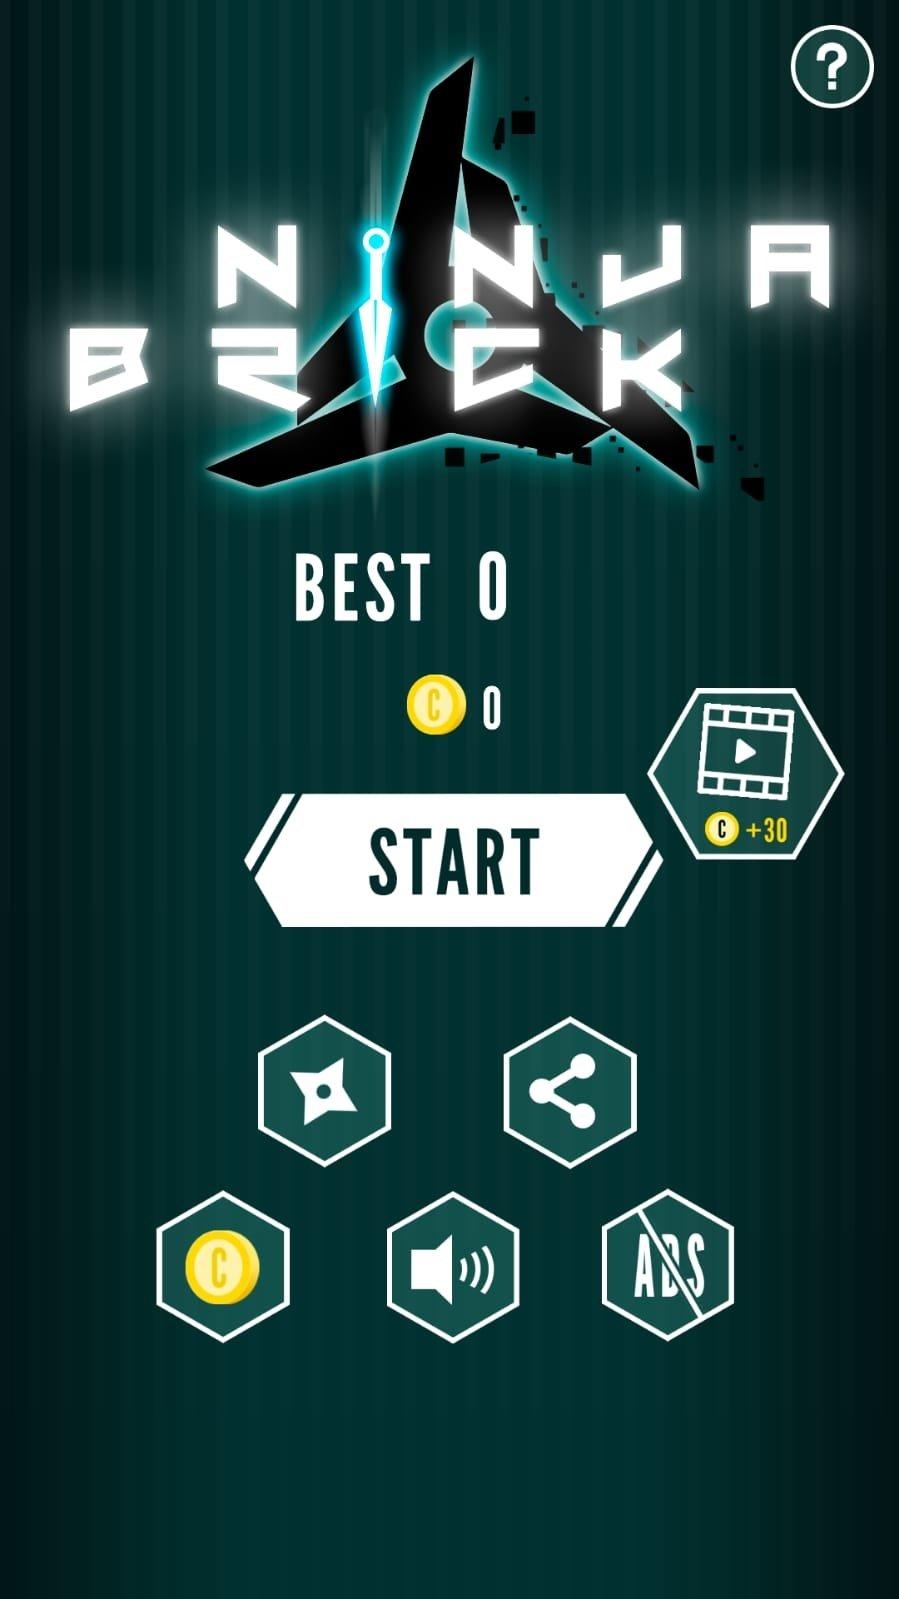 Ninja Brick Android image 3